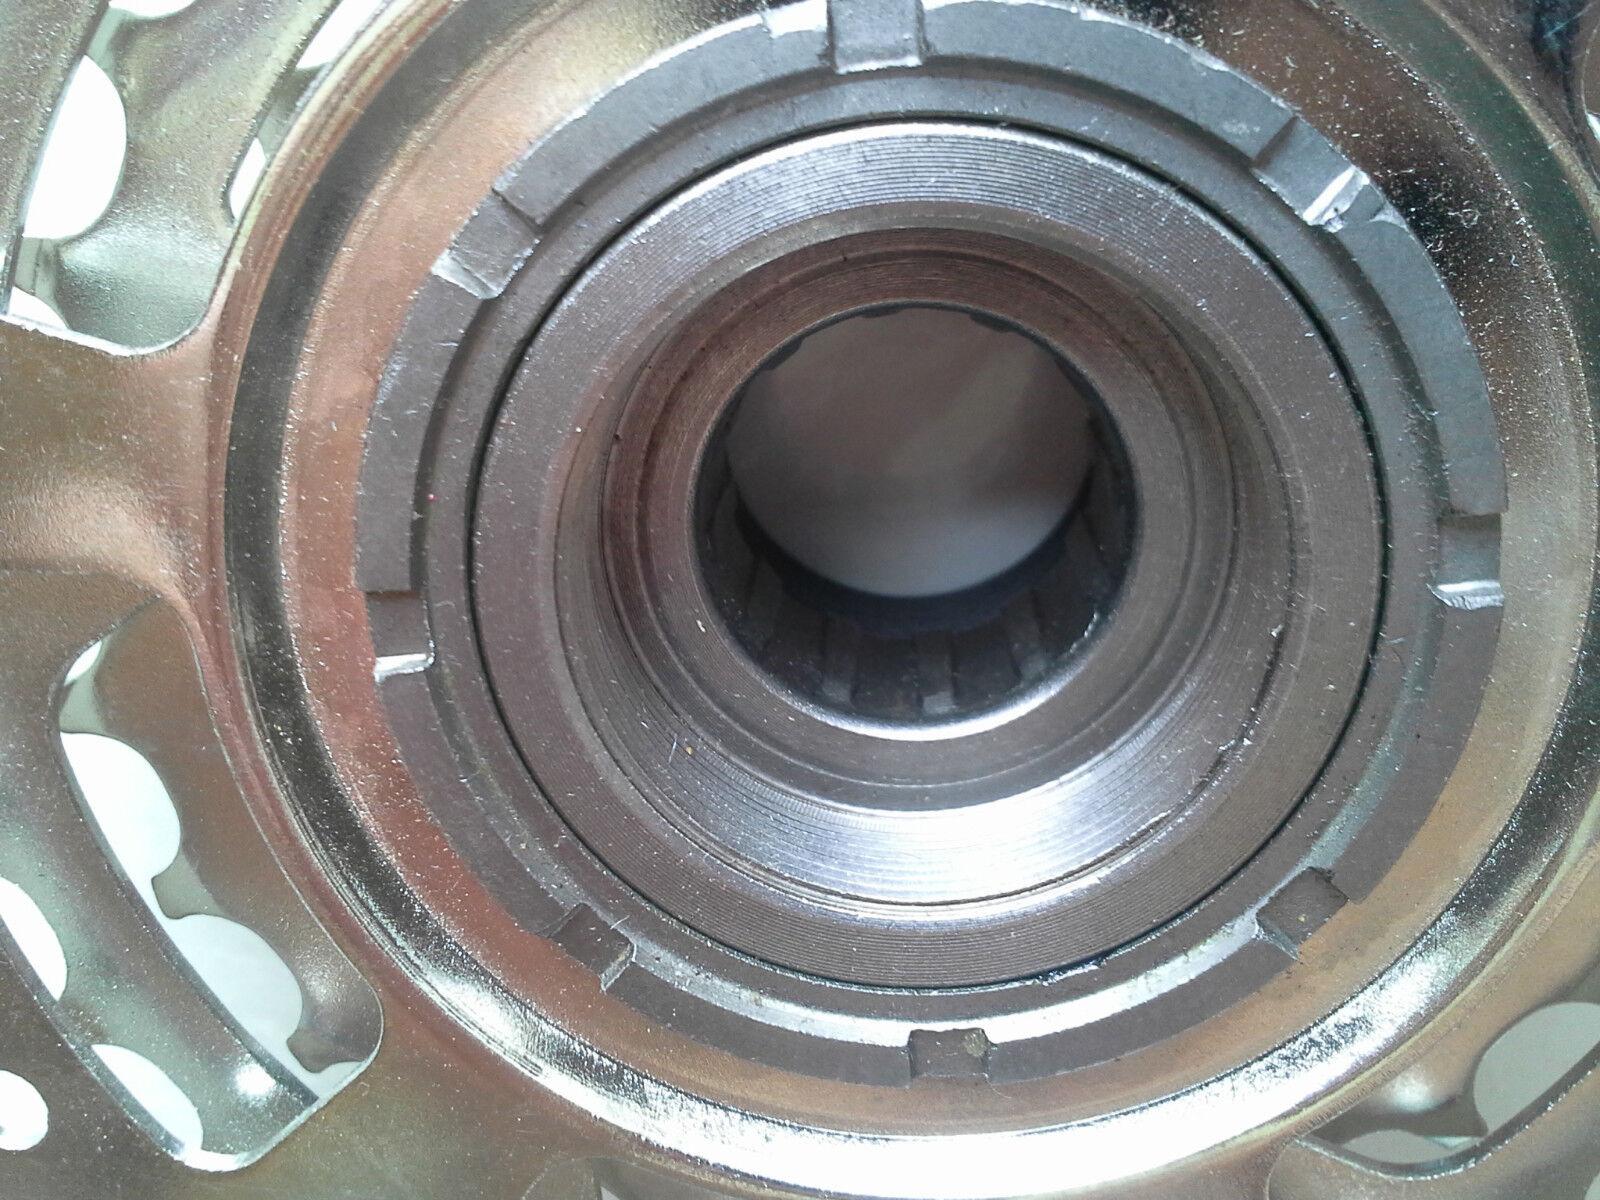 DNP Thread On 10 Speed Bike Bicycle Freewheel Cog 10S 11-32T replace TZ20 TZ21